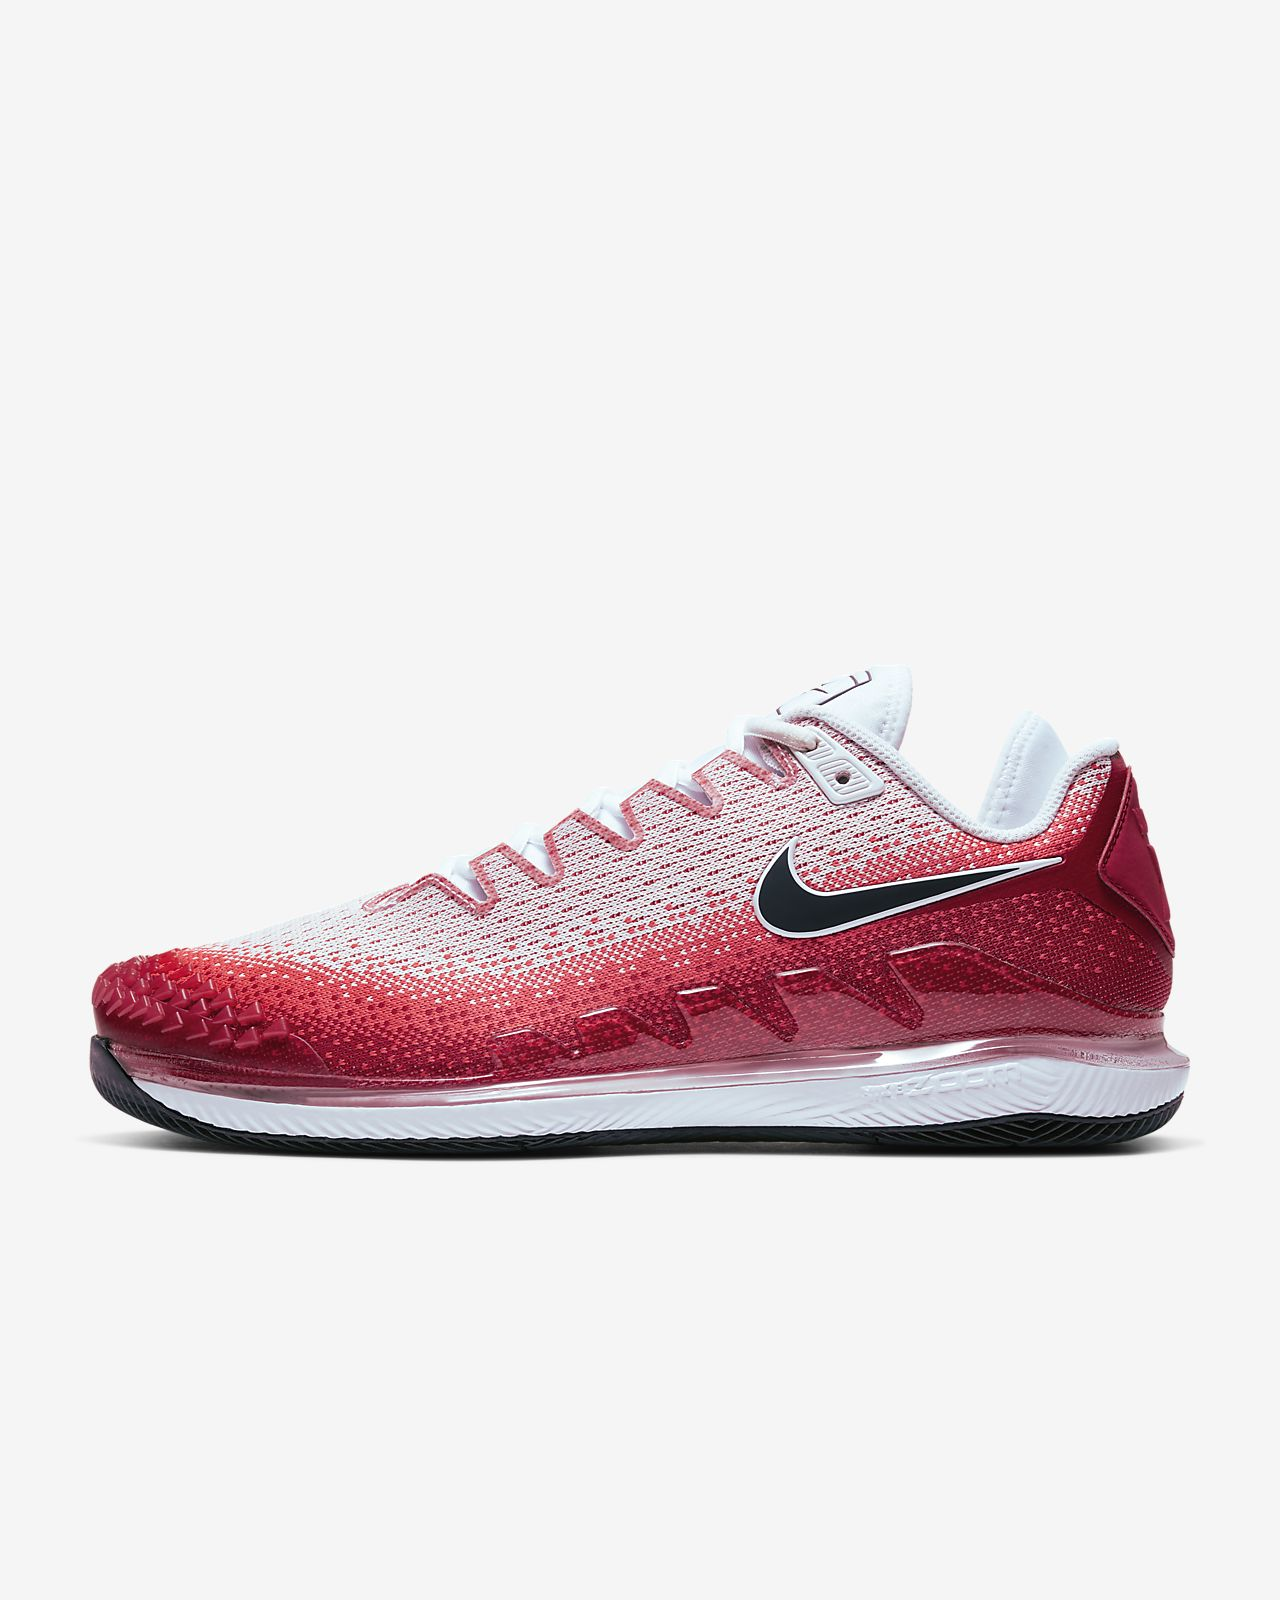 Scarpa da tennis per campi in cemento NikeCourt Air Zoom Vapor X Knit - Uomo